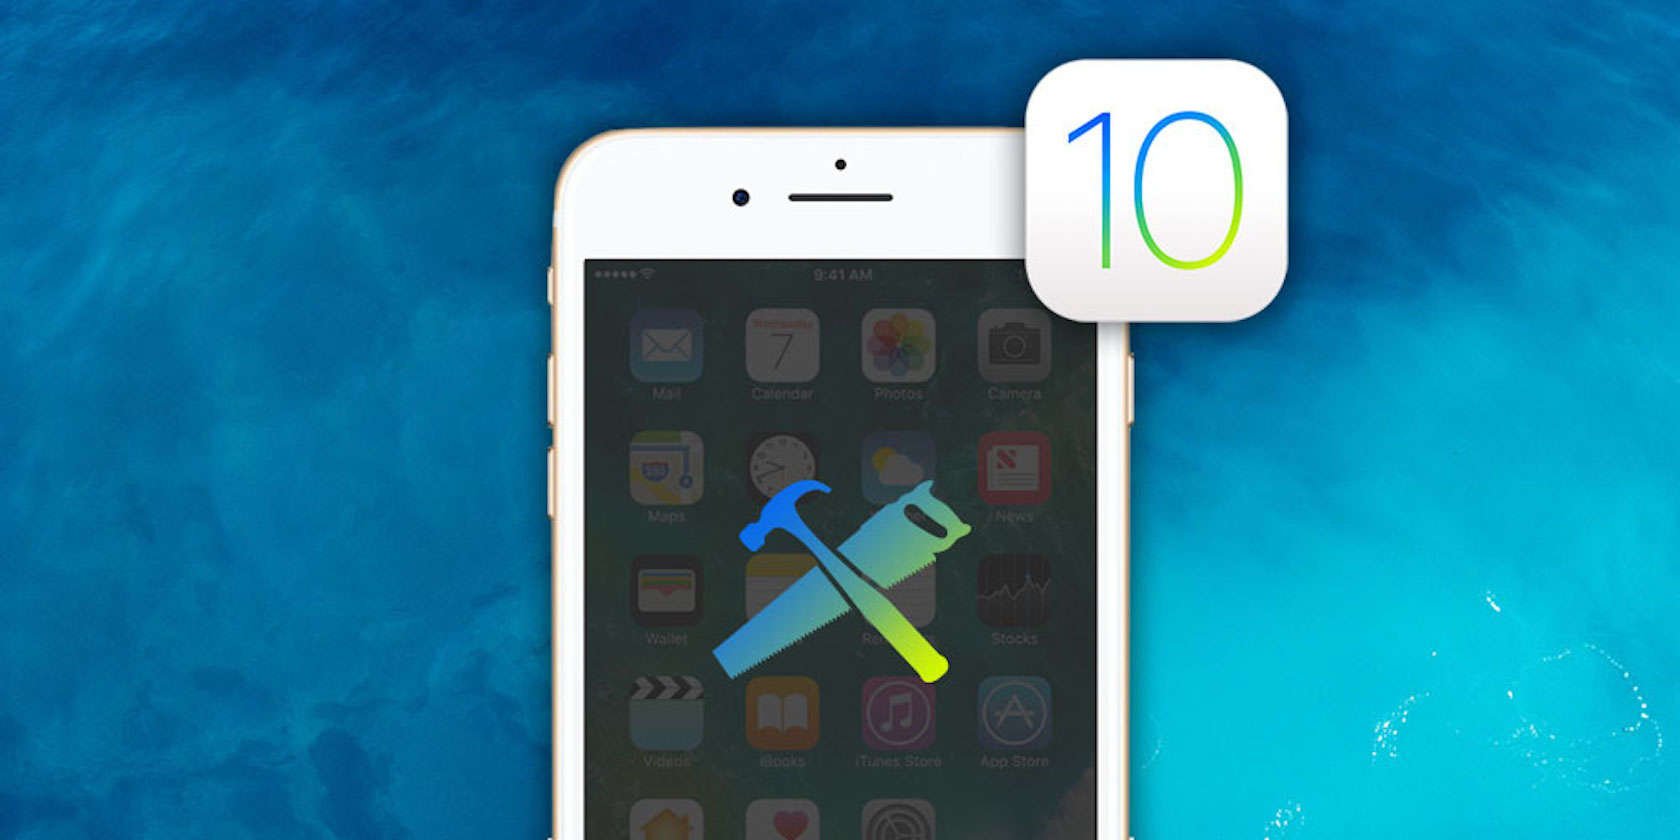 CoM - The 2017 iOS 10 Complete App Builder Bundle